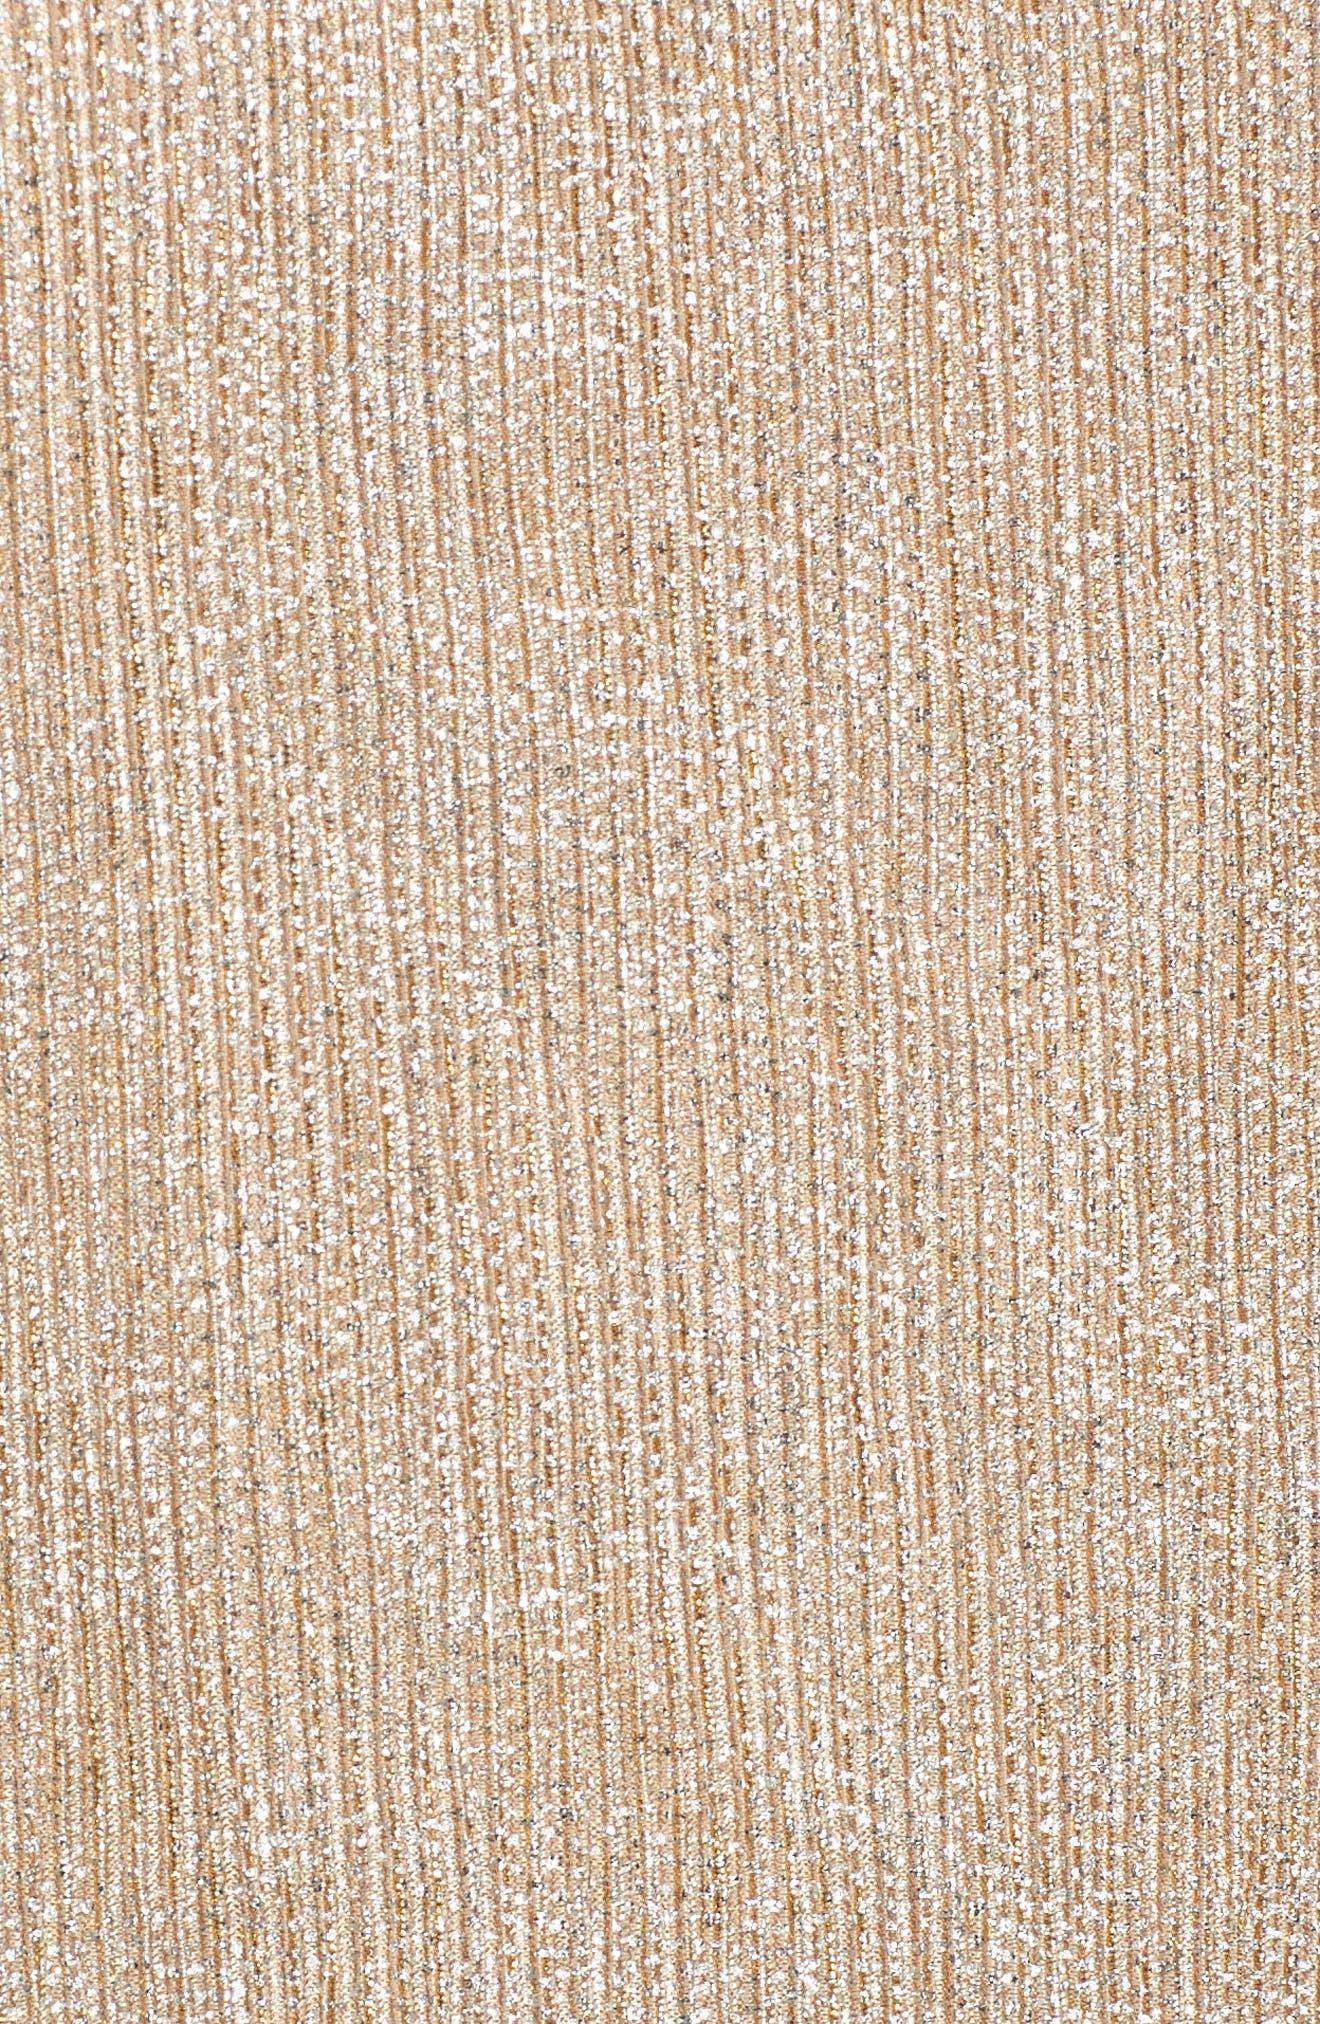 Metallic Knit Tee,                             Alternate thumbnail 5, color,                             Champagne